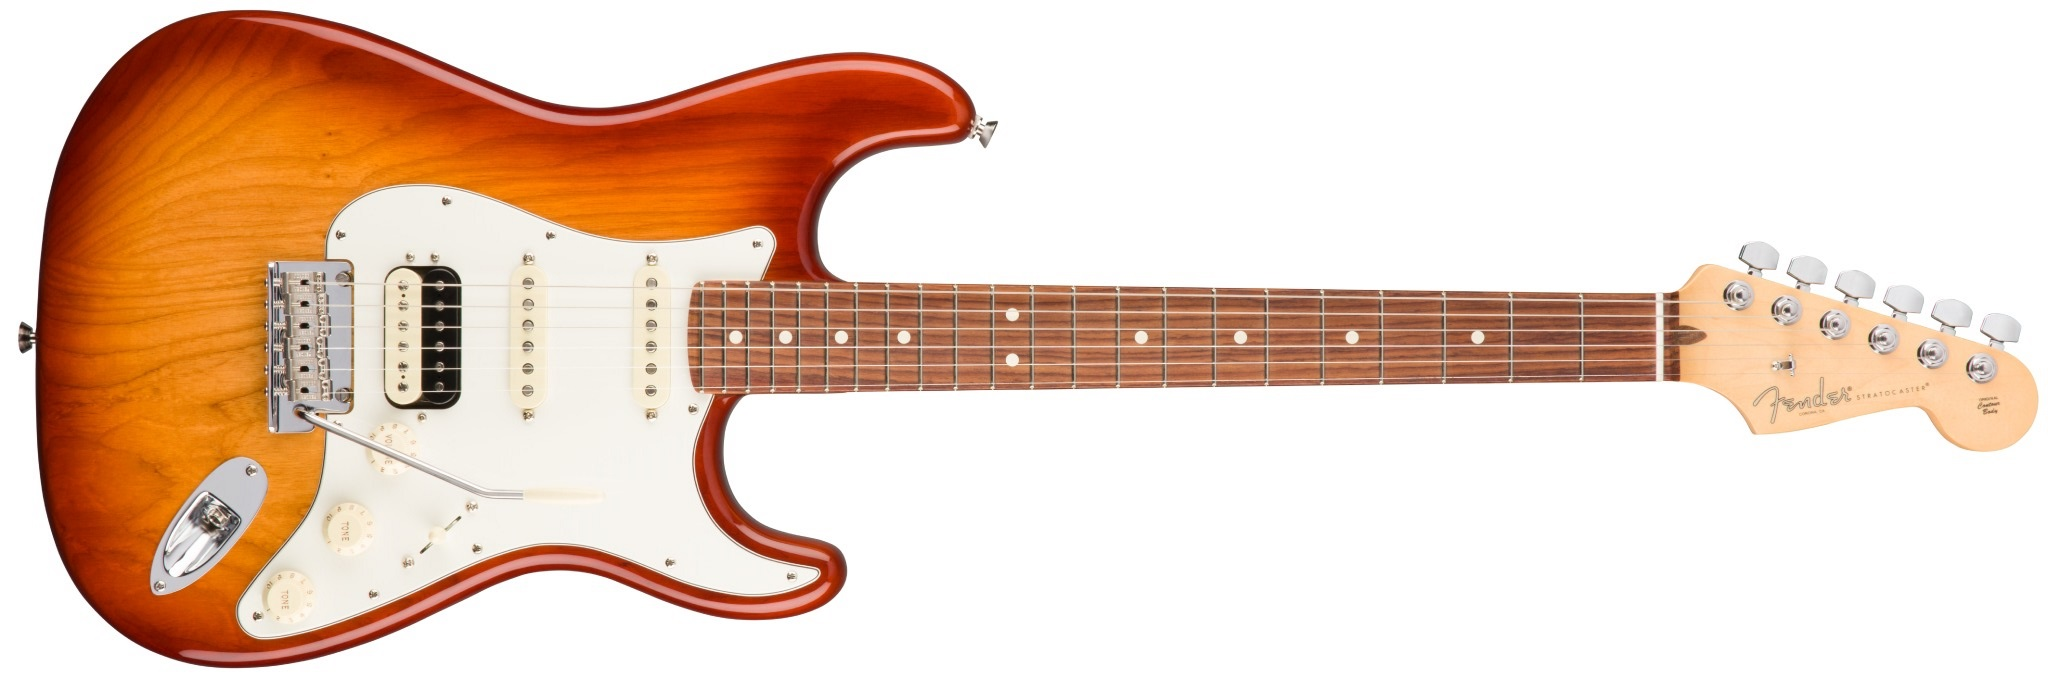 Fender American Pro Stratocaster HSS Shawbuckers RW SSB ASH